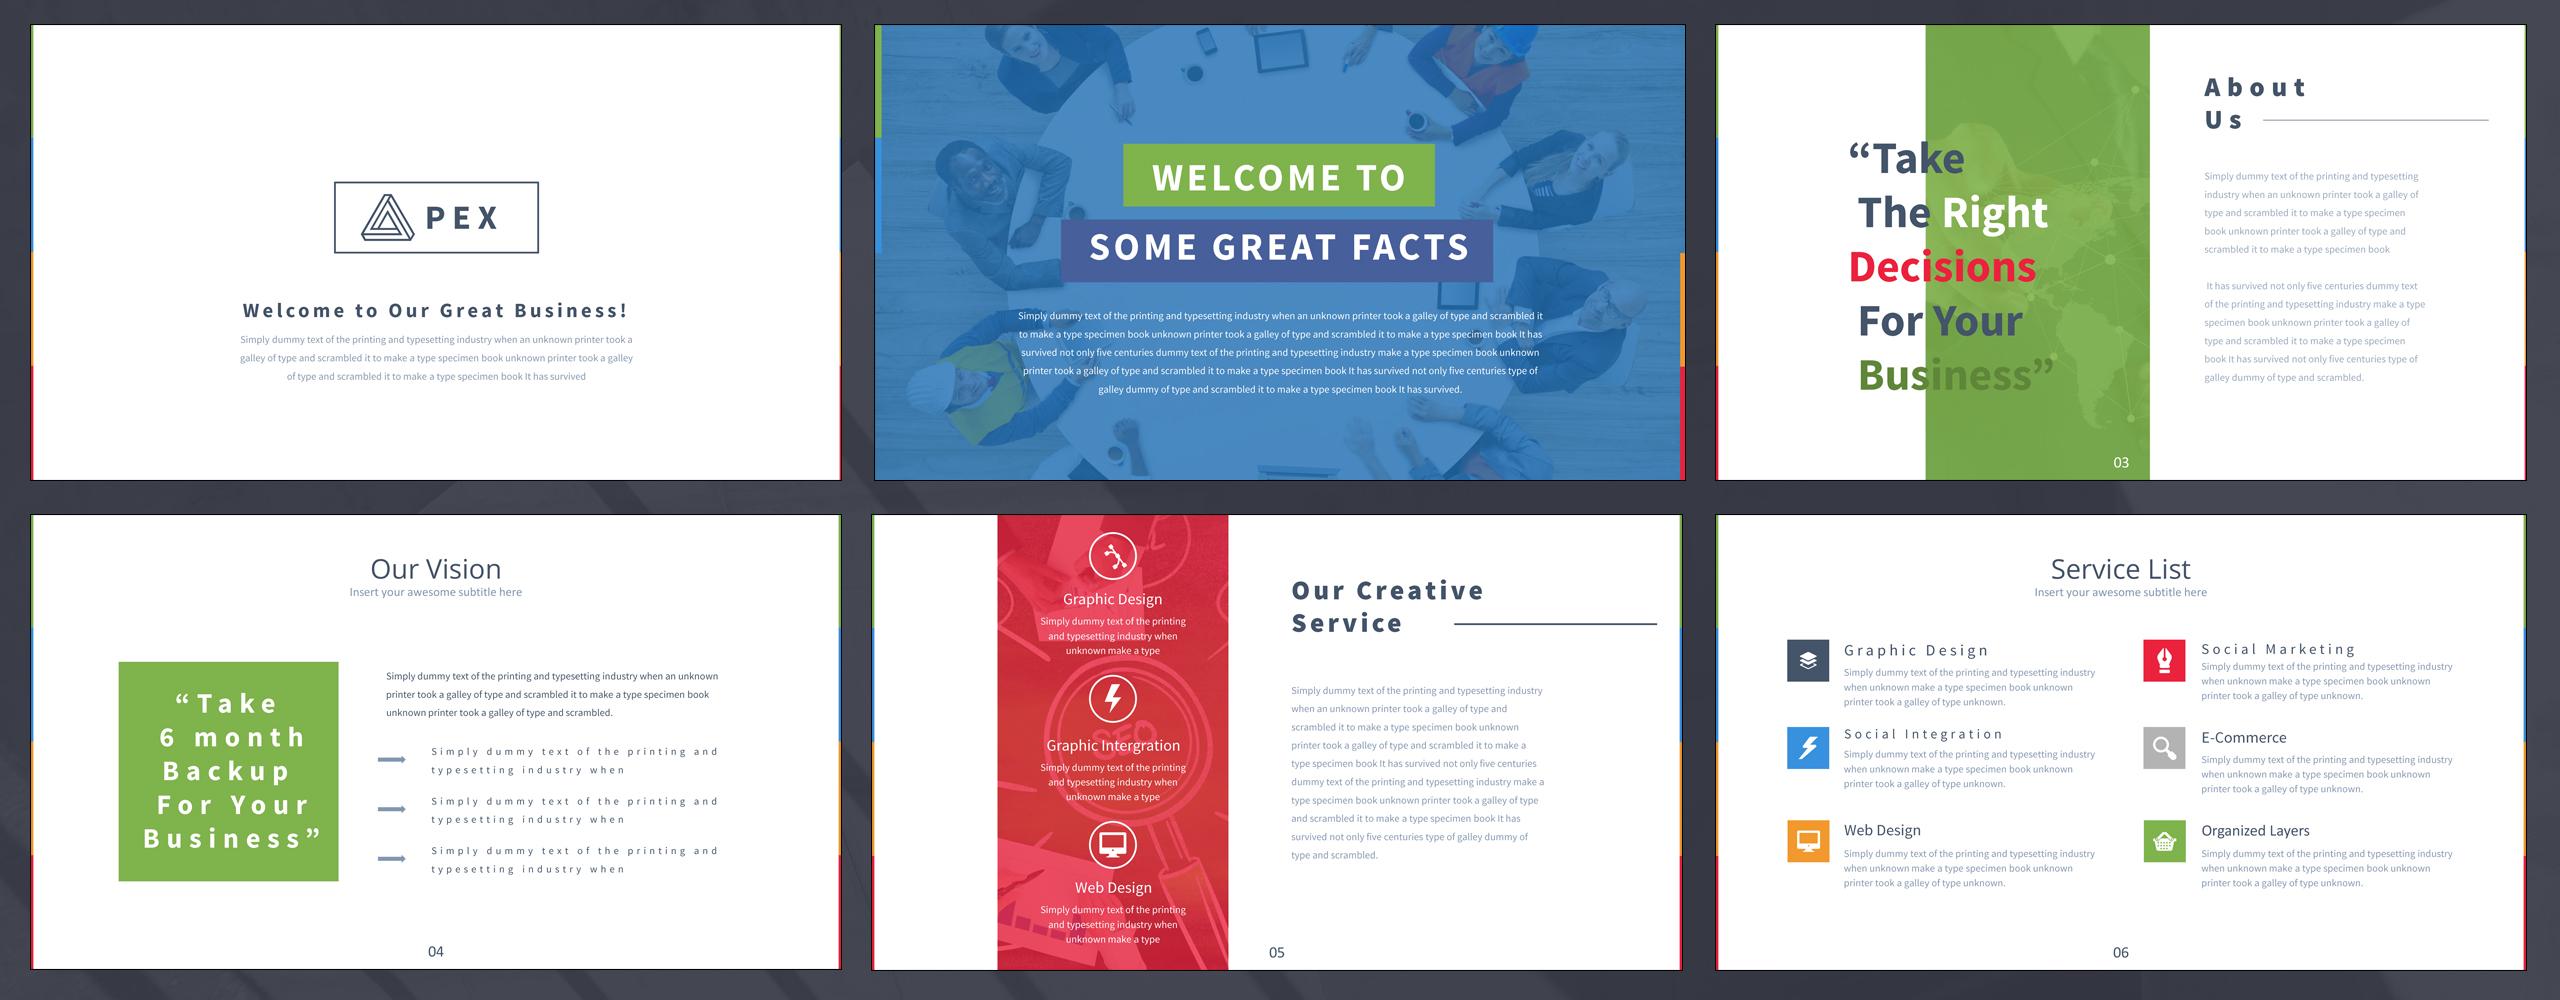 Apex - PowerPoint Presentation Template